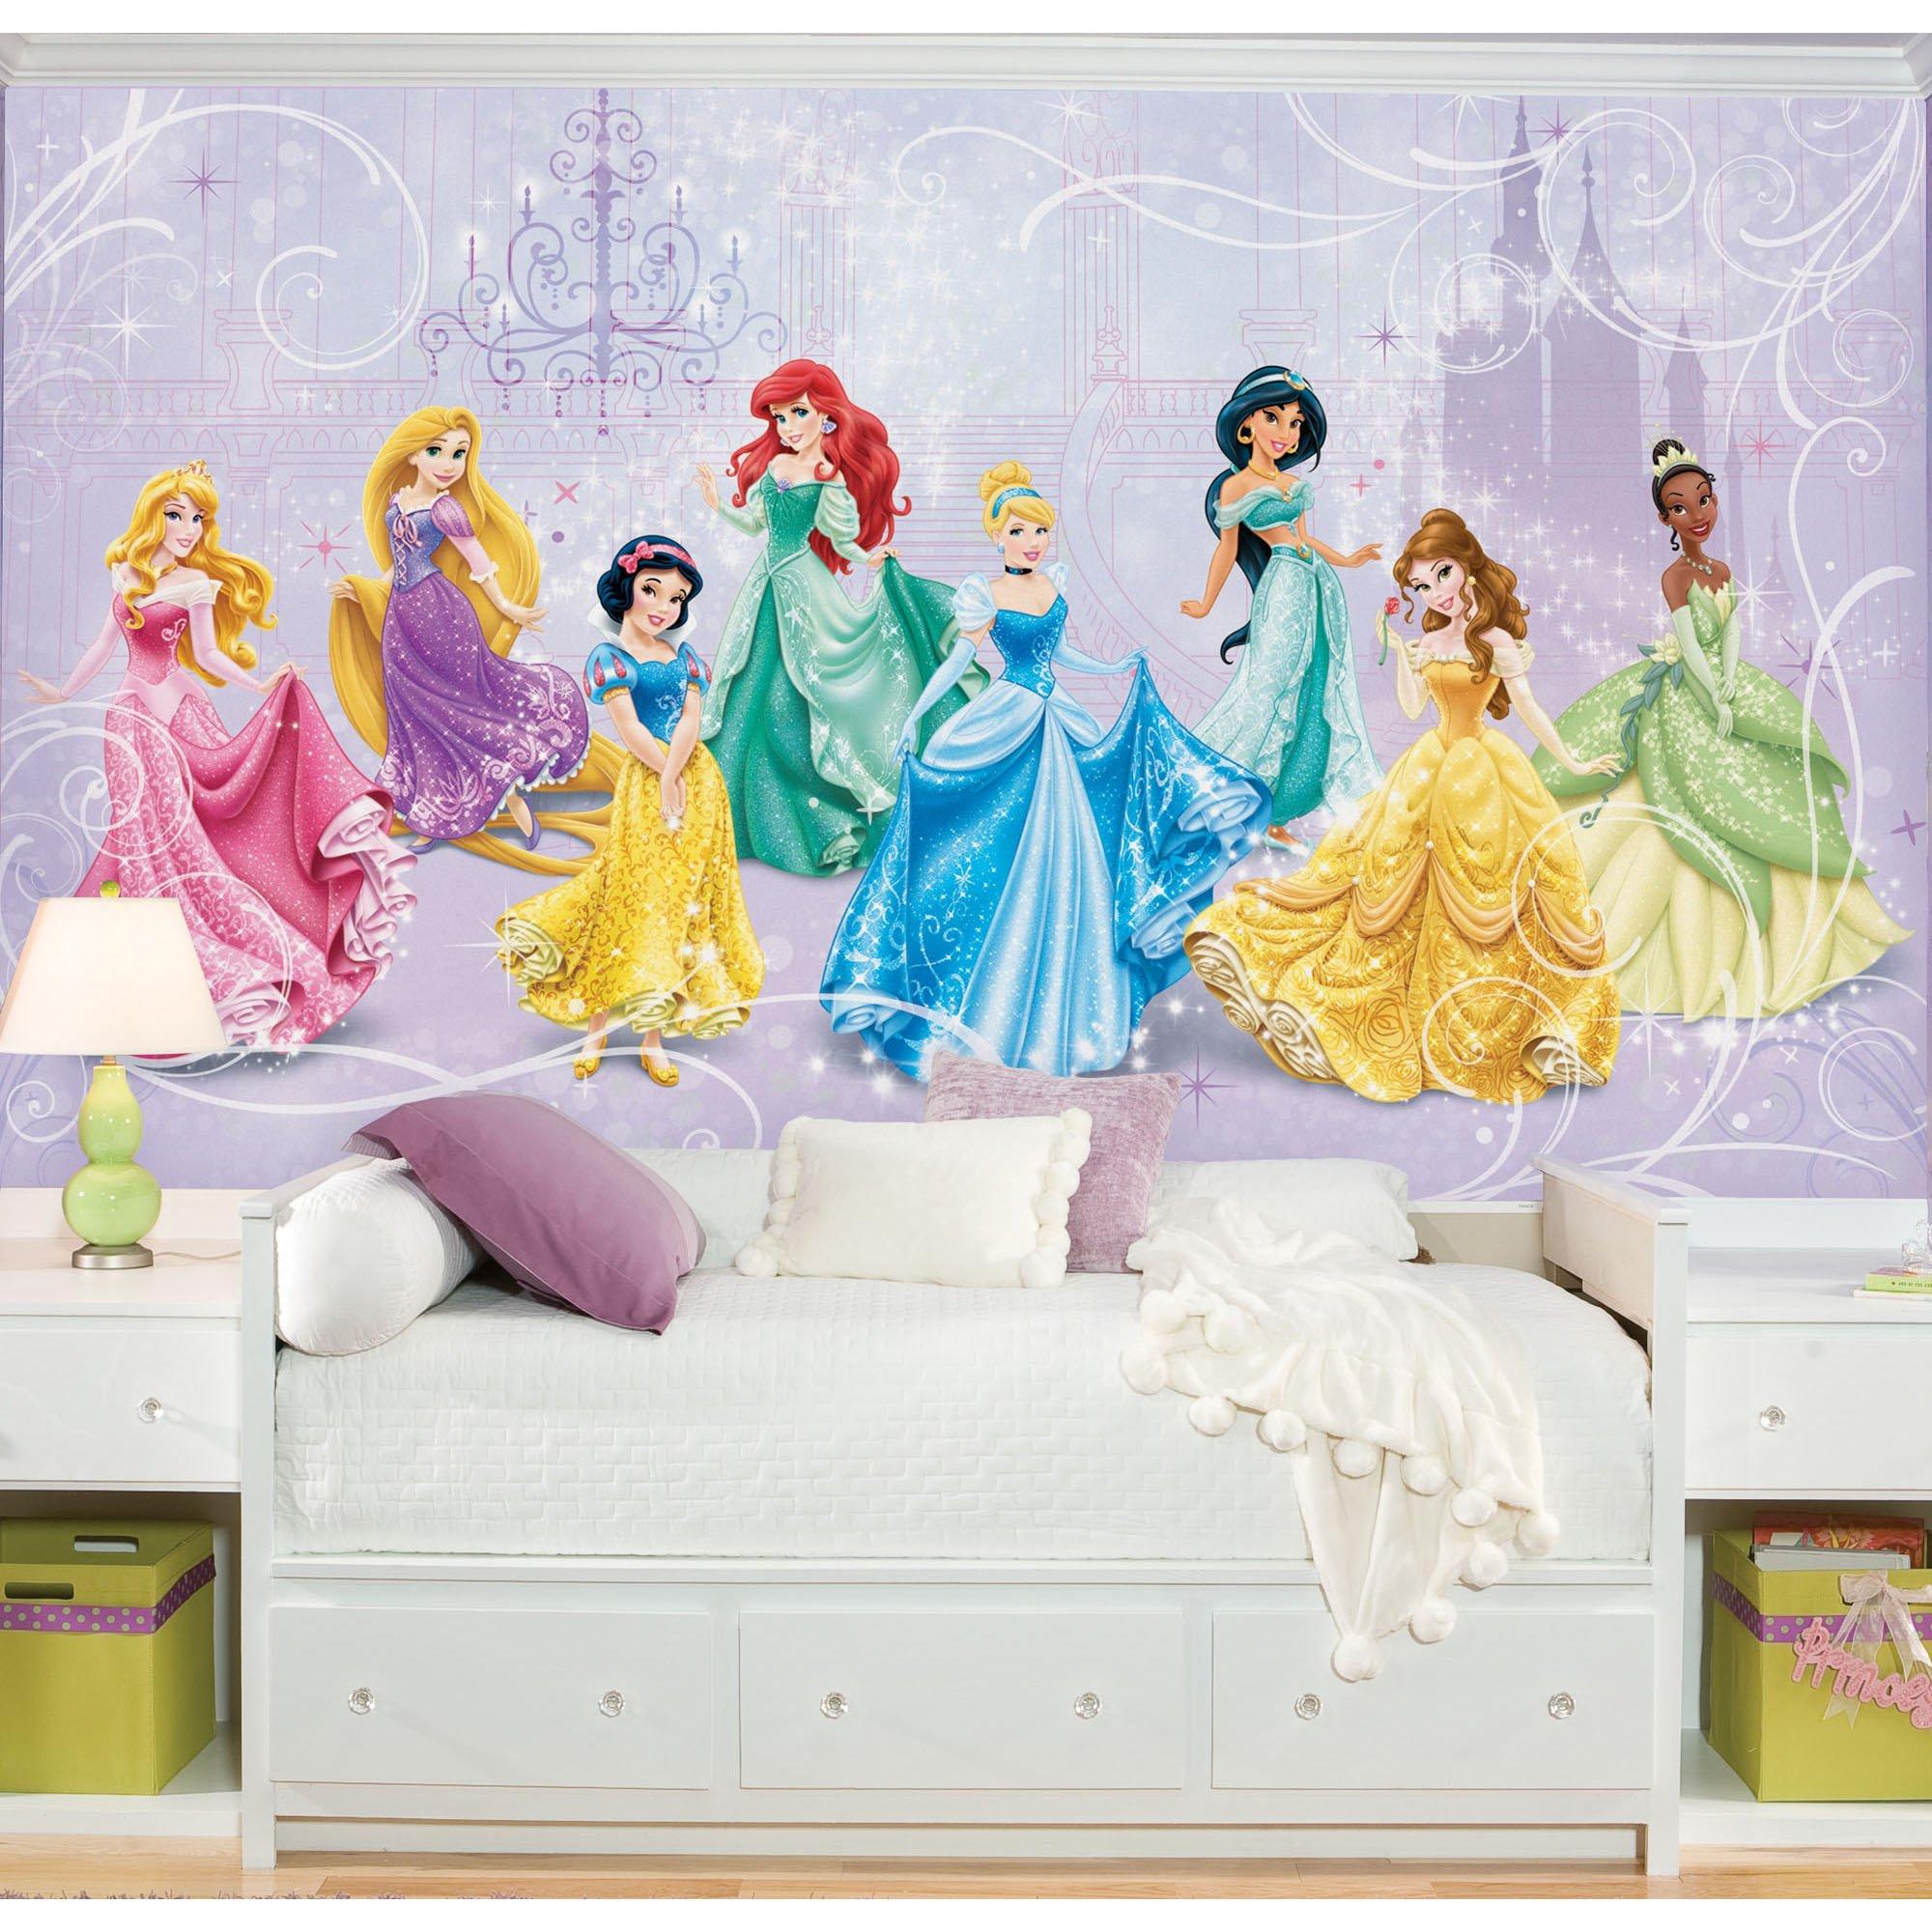 RoomMates Disney Princess Royal Debut Prepasted, Removable Wall Mural - 6' X 10.5' by RoomMates (Image #2)